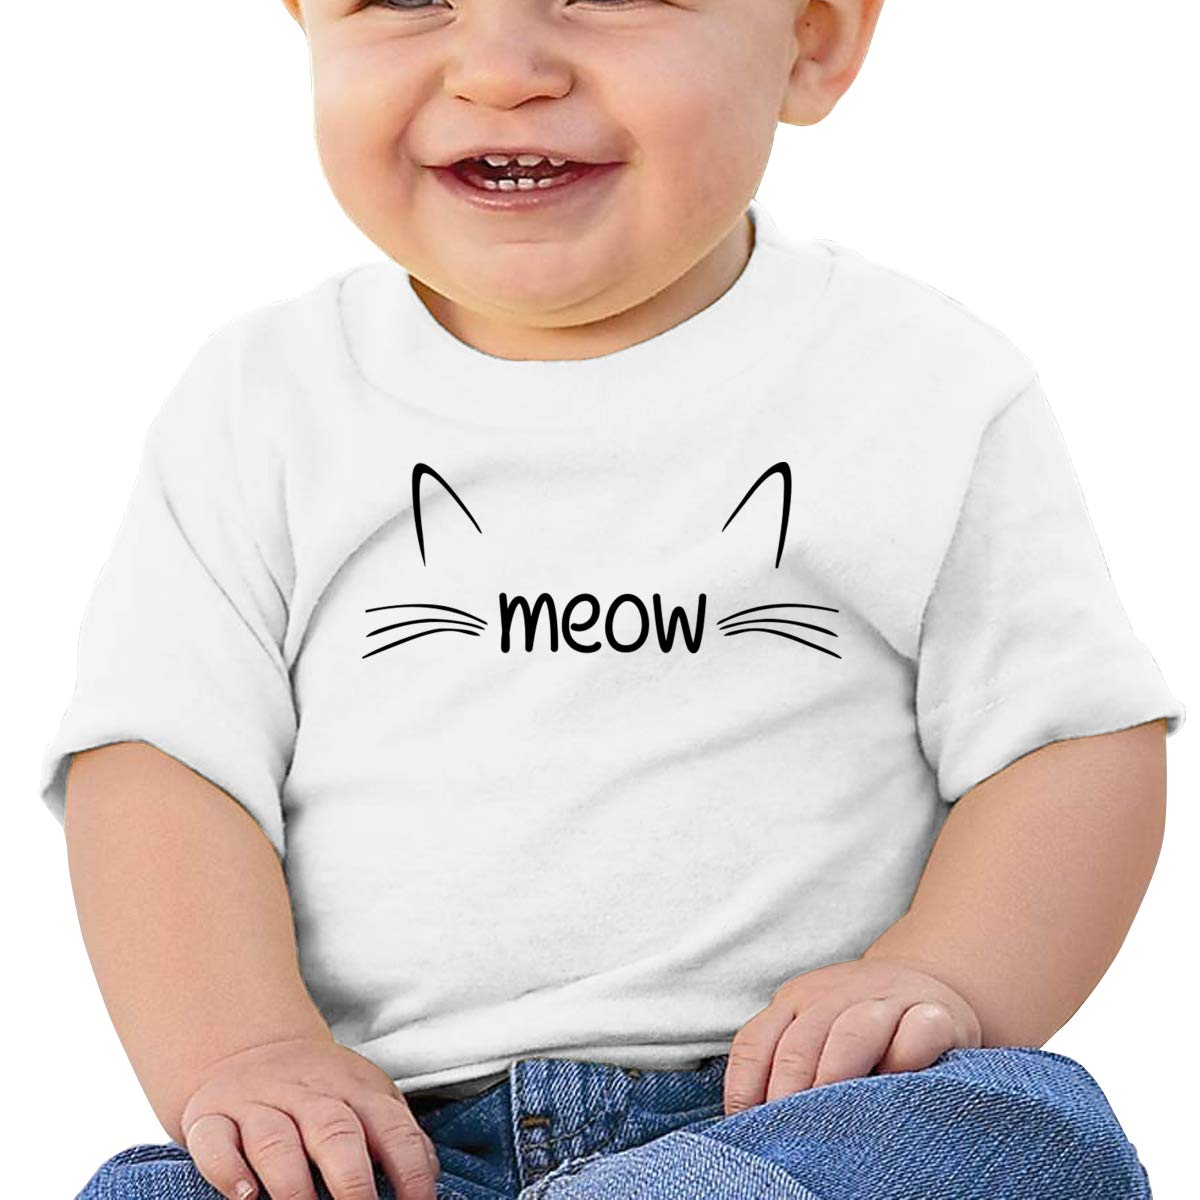 Cat Meow 2 Short-Sleeves Tee Baby Girls